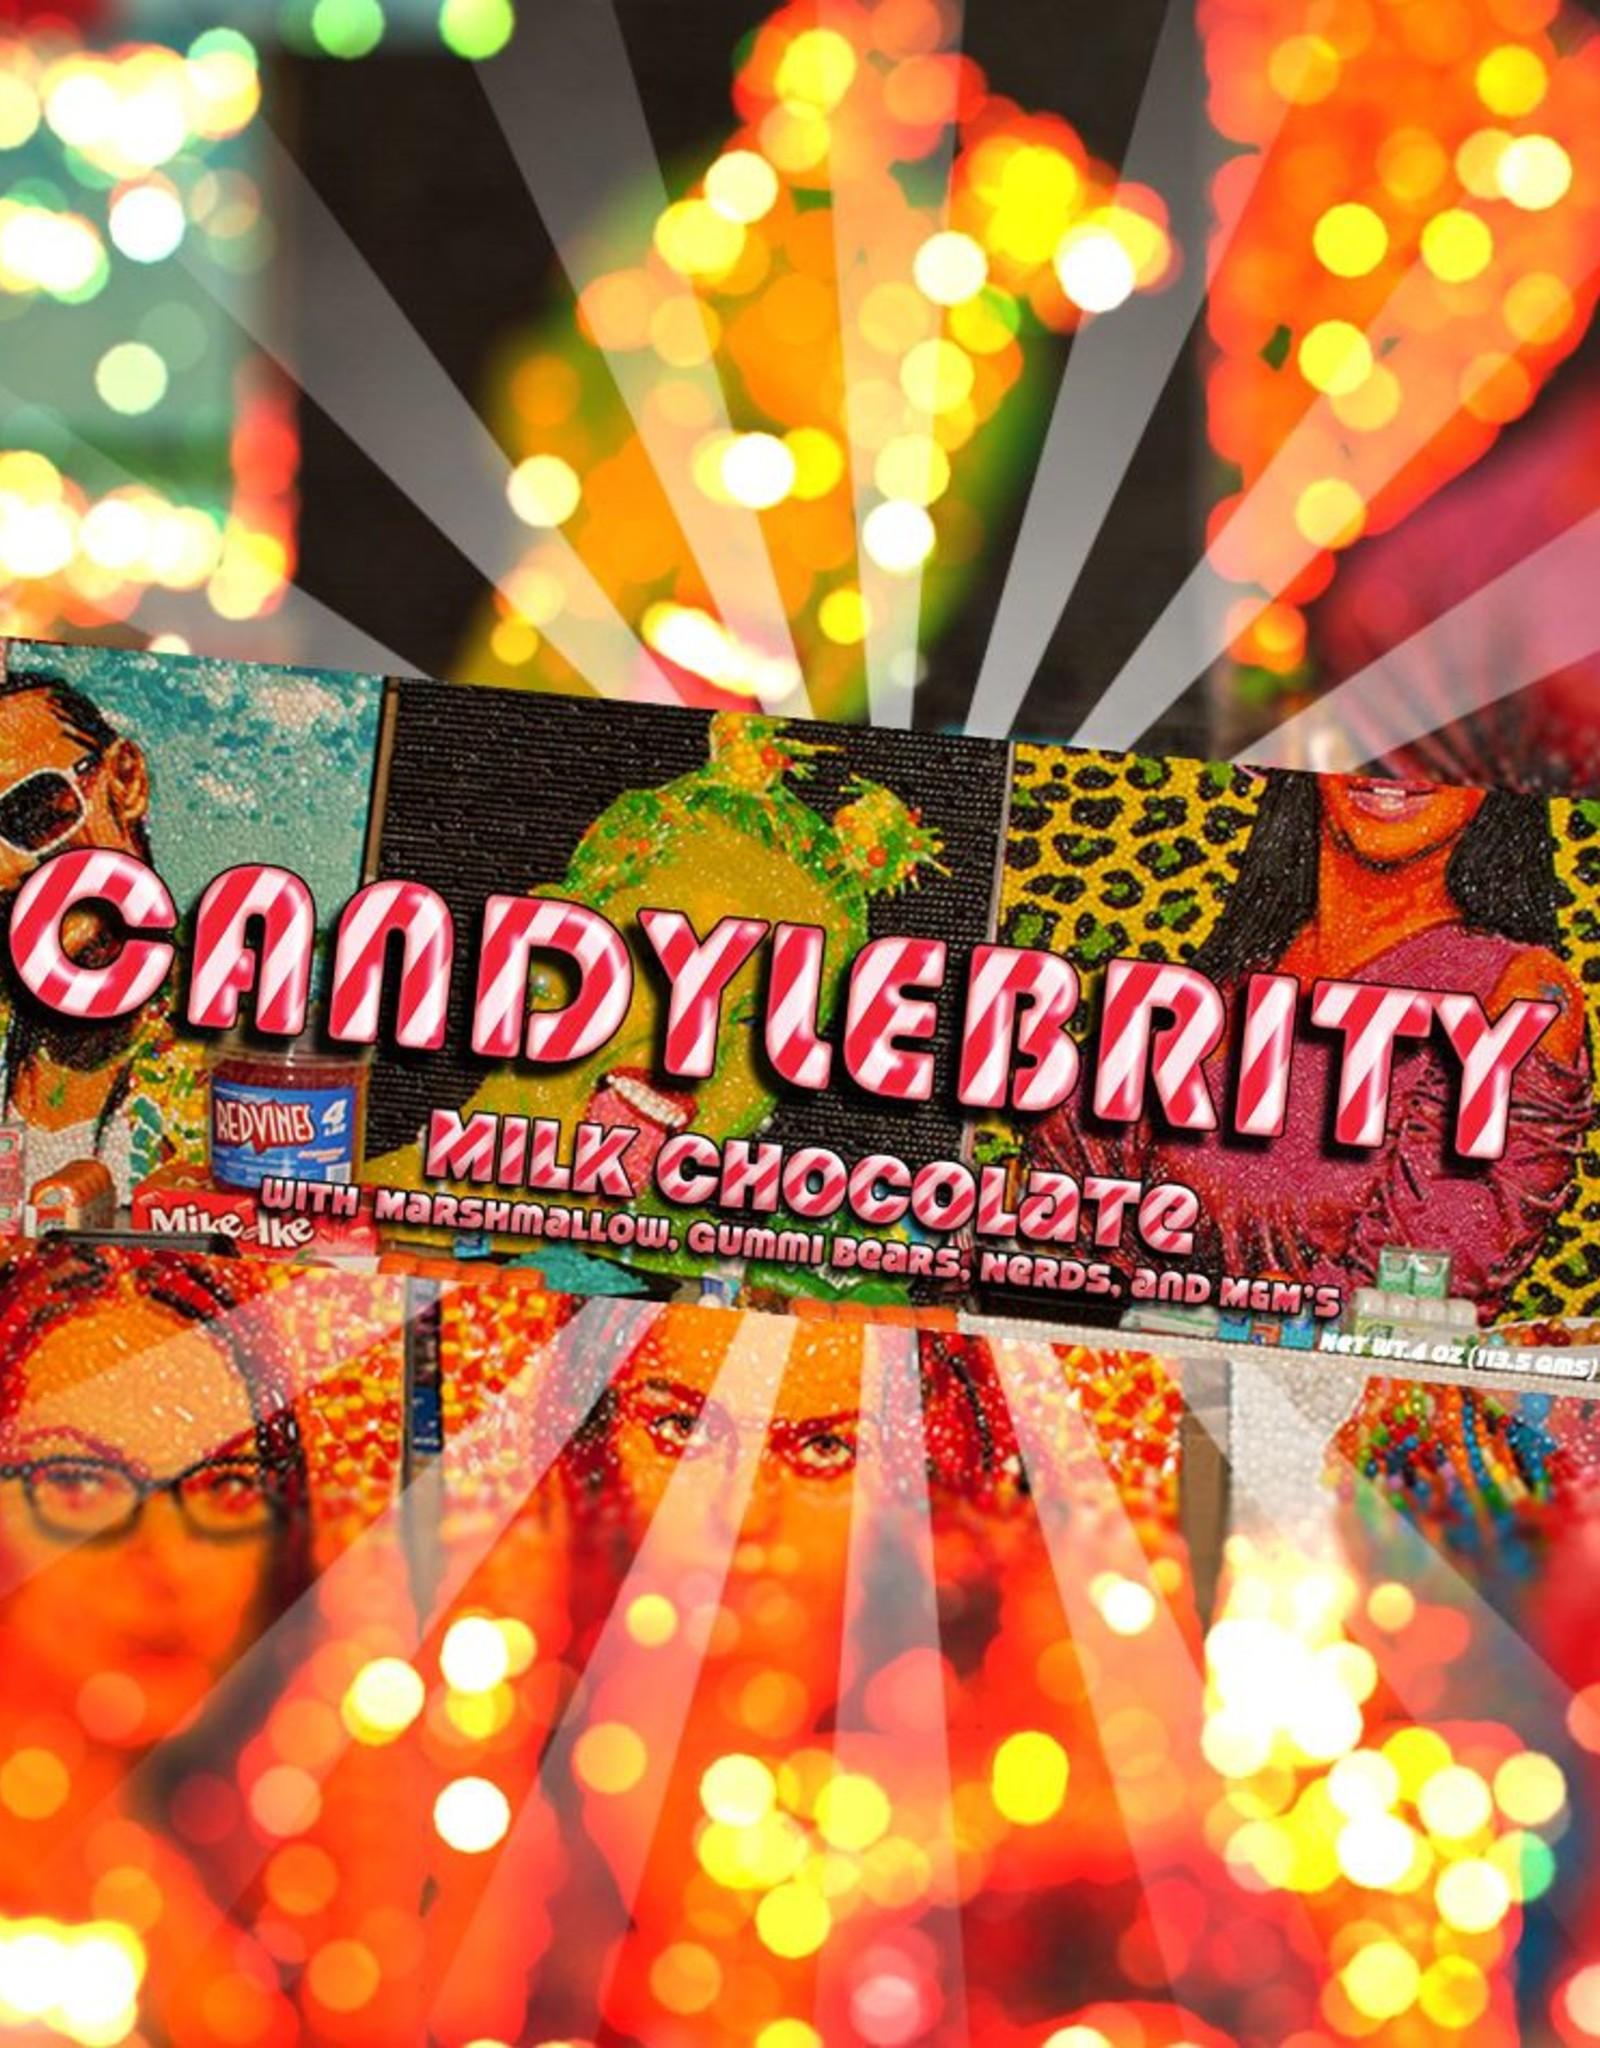 Candylebrity Bar